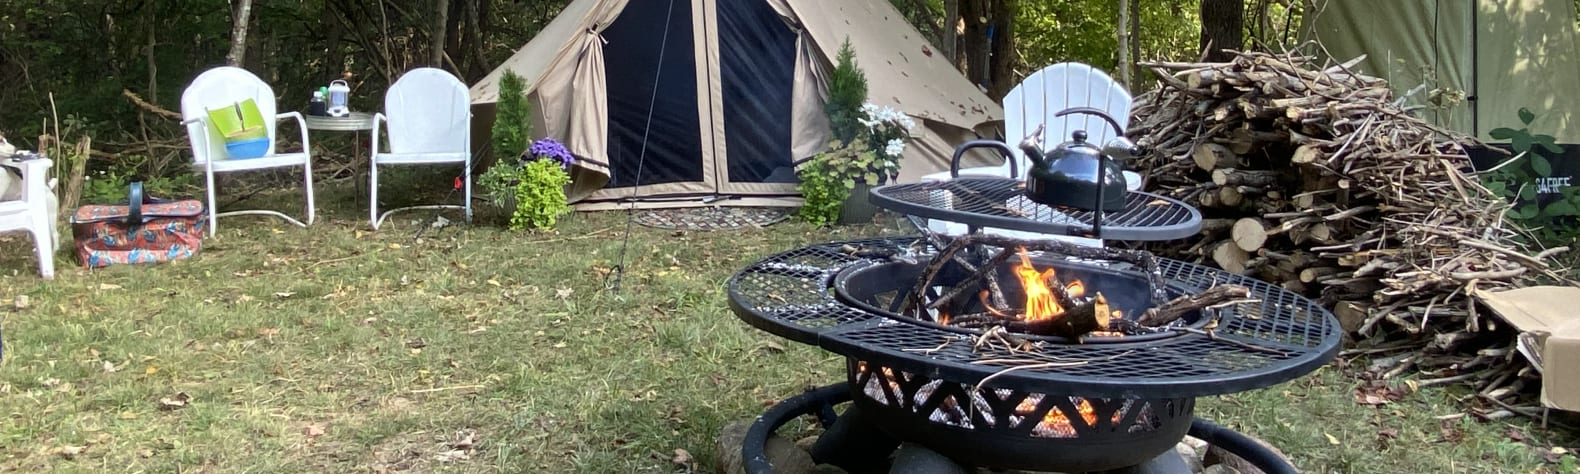 Wooded Retreats at Bristle Ridge